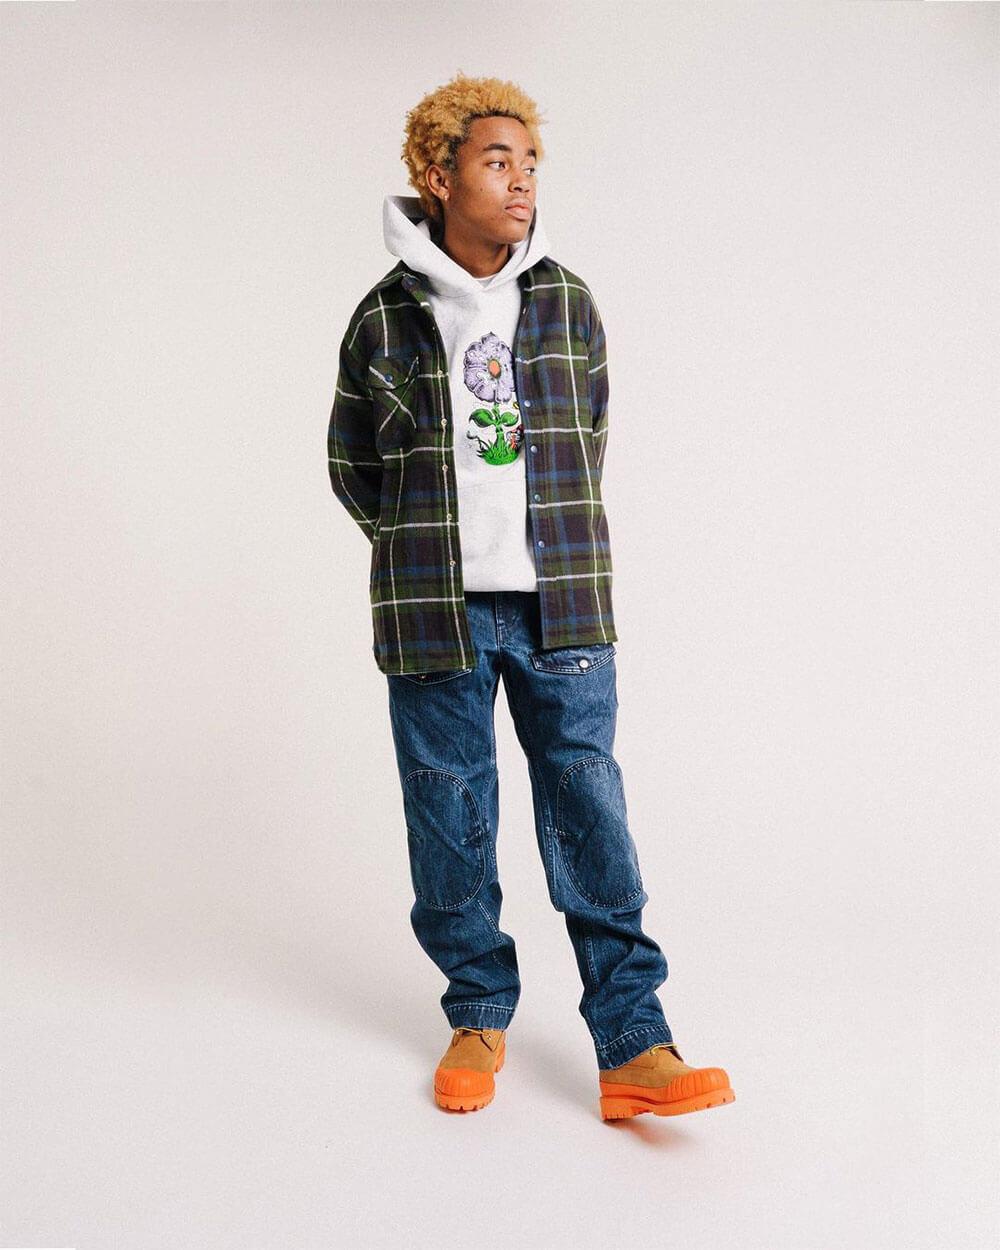 Billionaire Boys Club streetwear